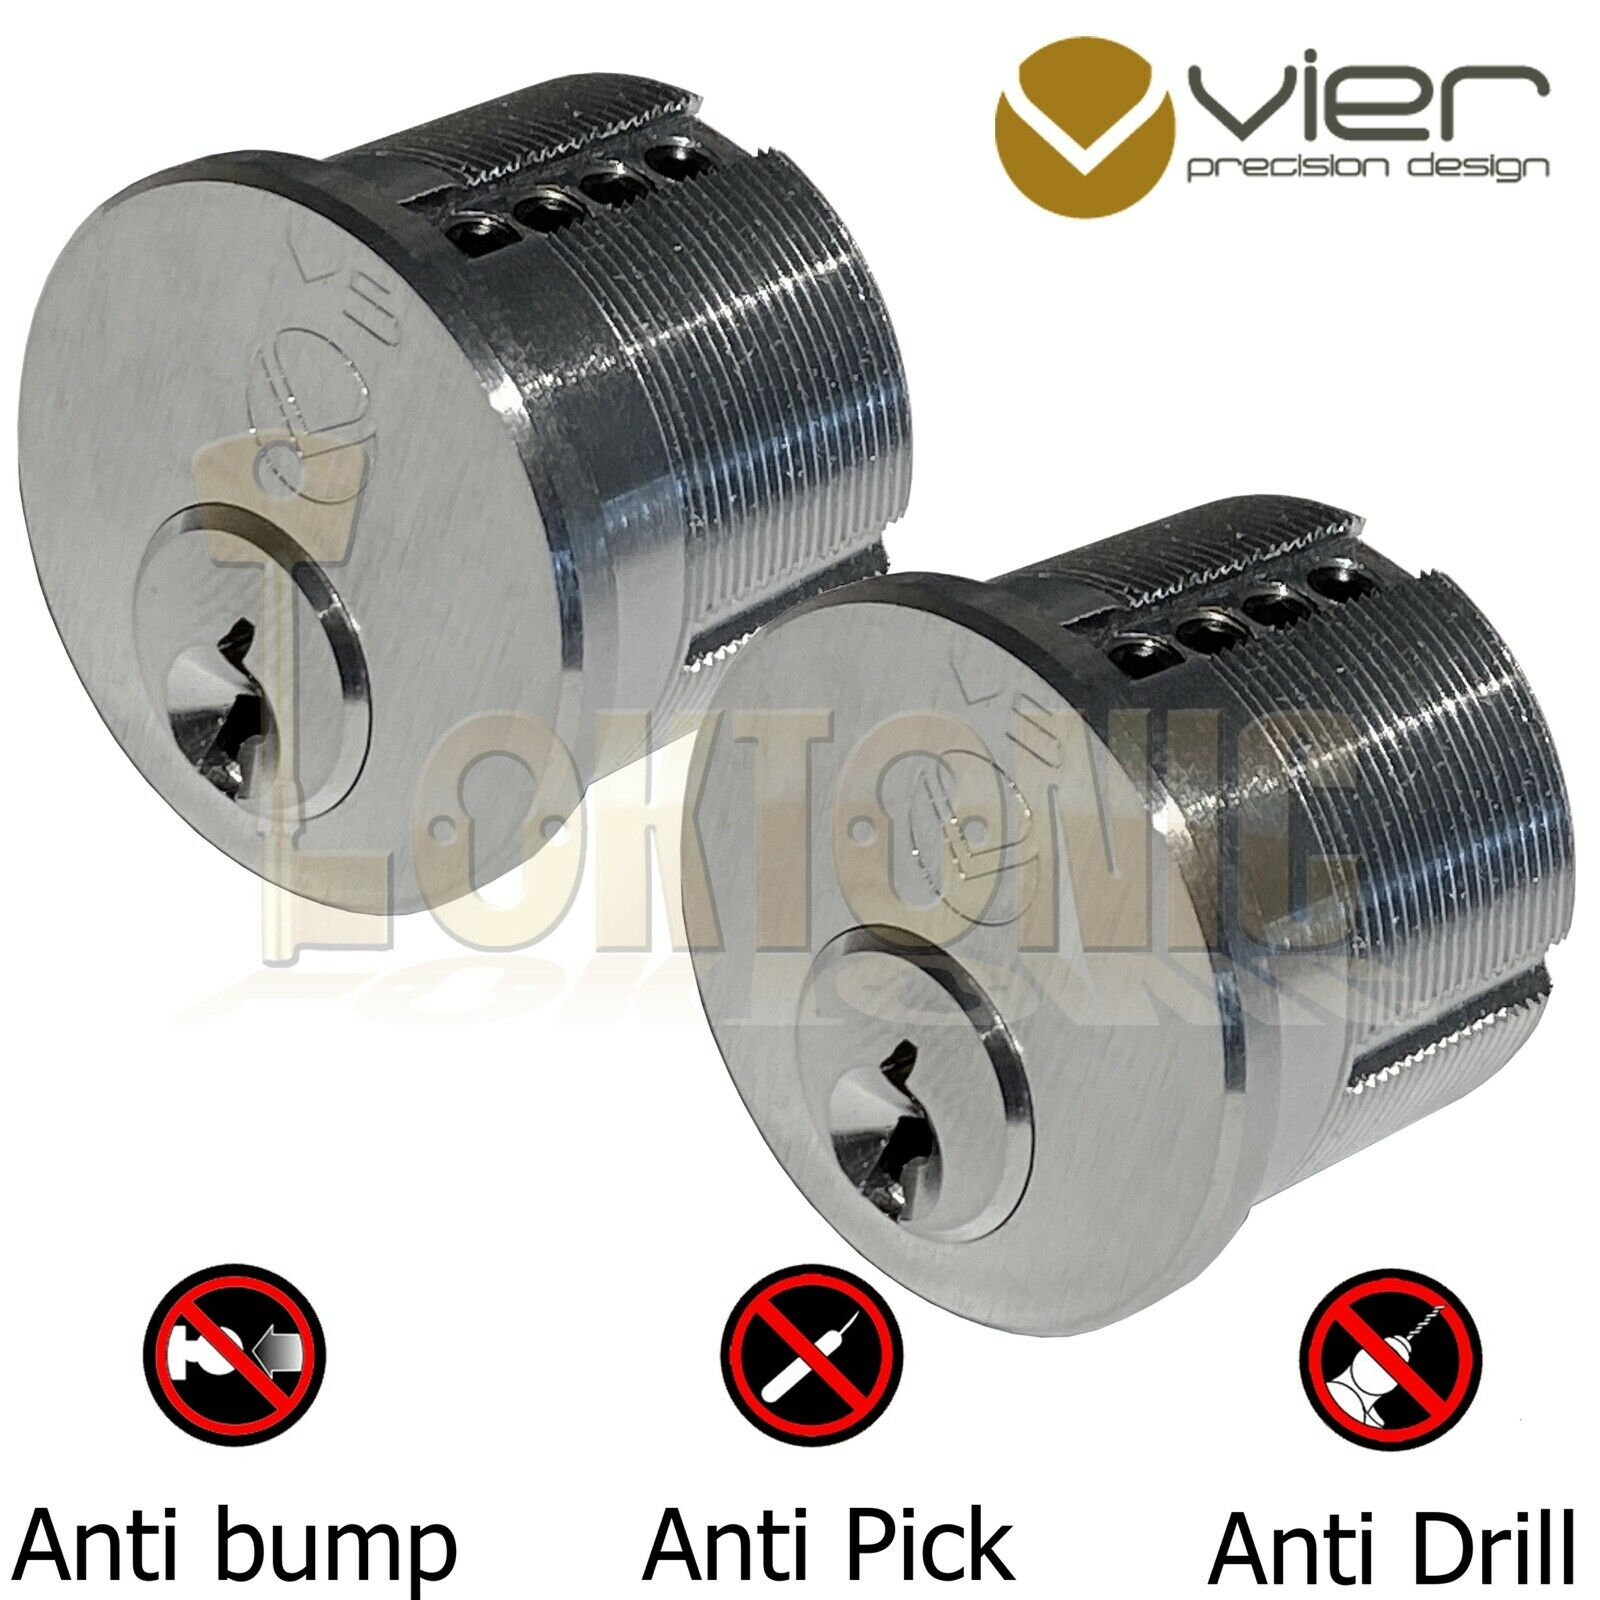 Vier Screw in Round Mortice Cylinder Lock Barrel Pair to Suit Adams Rite Lock